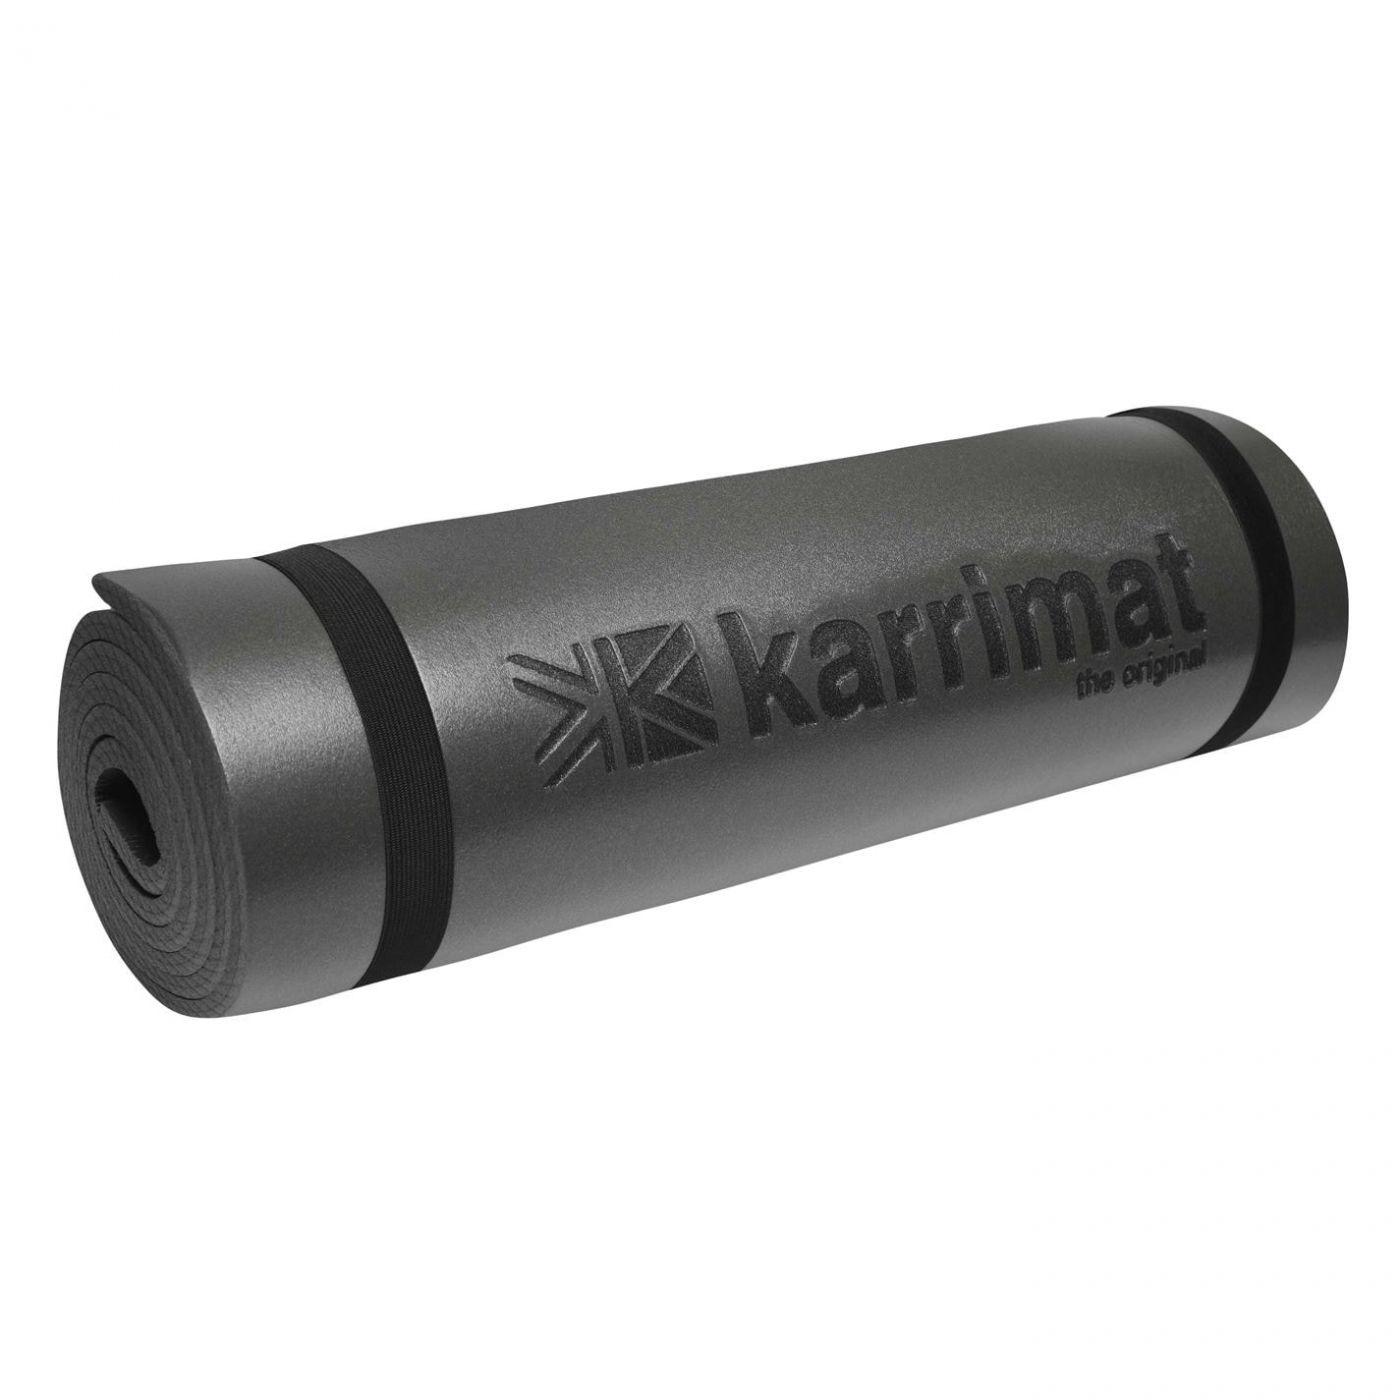 Karrimor Expedition Mat